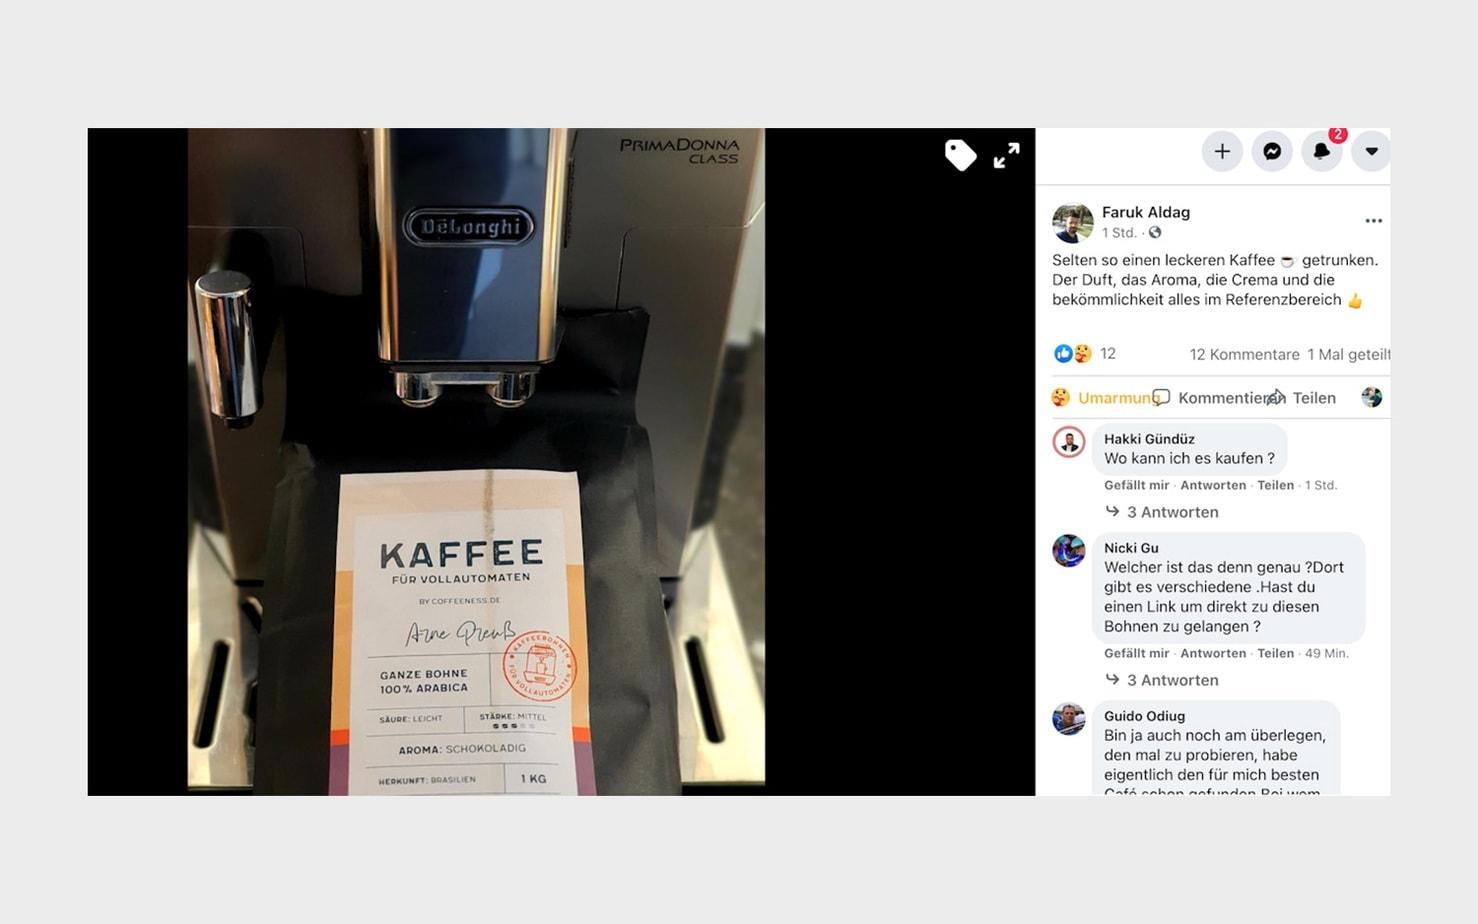 Bewertung Kunde Coffeeness Kaffee auf Facebook